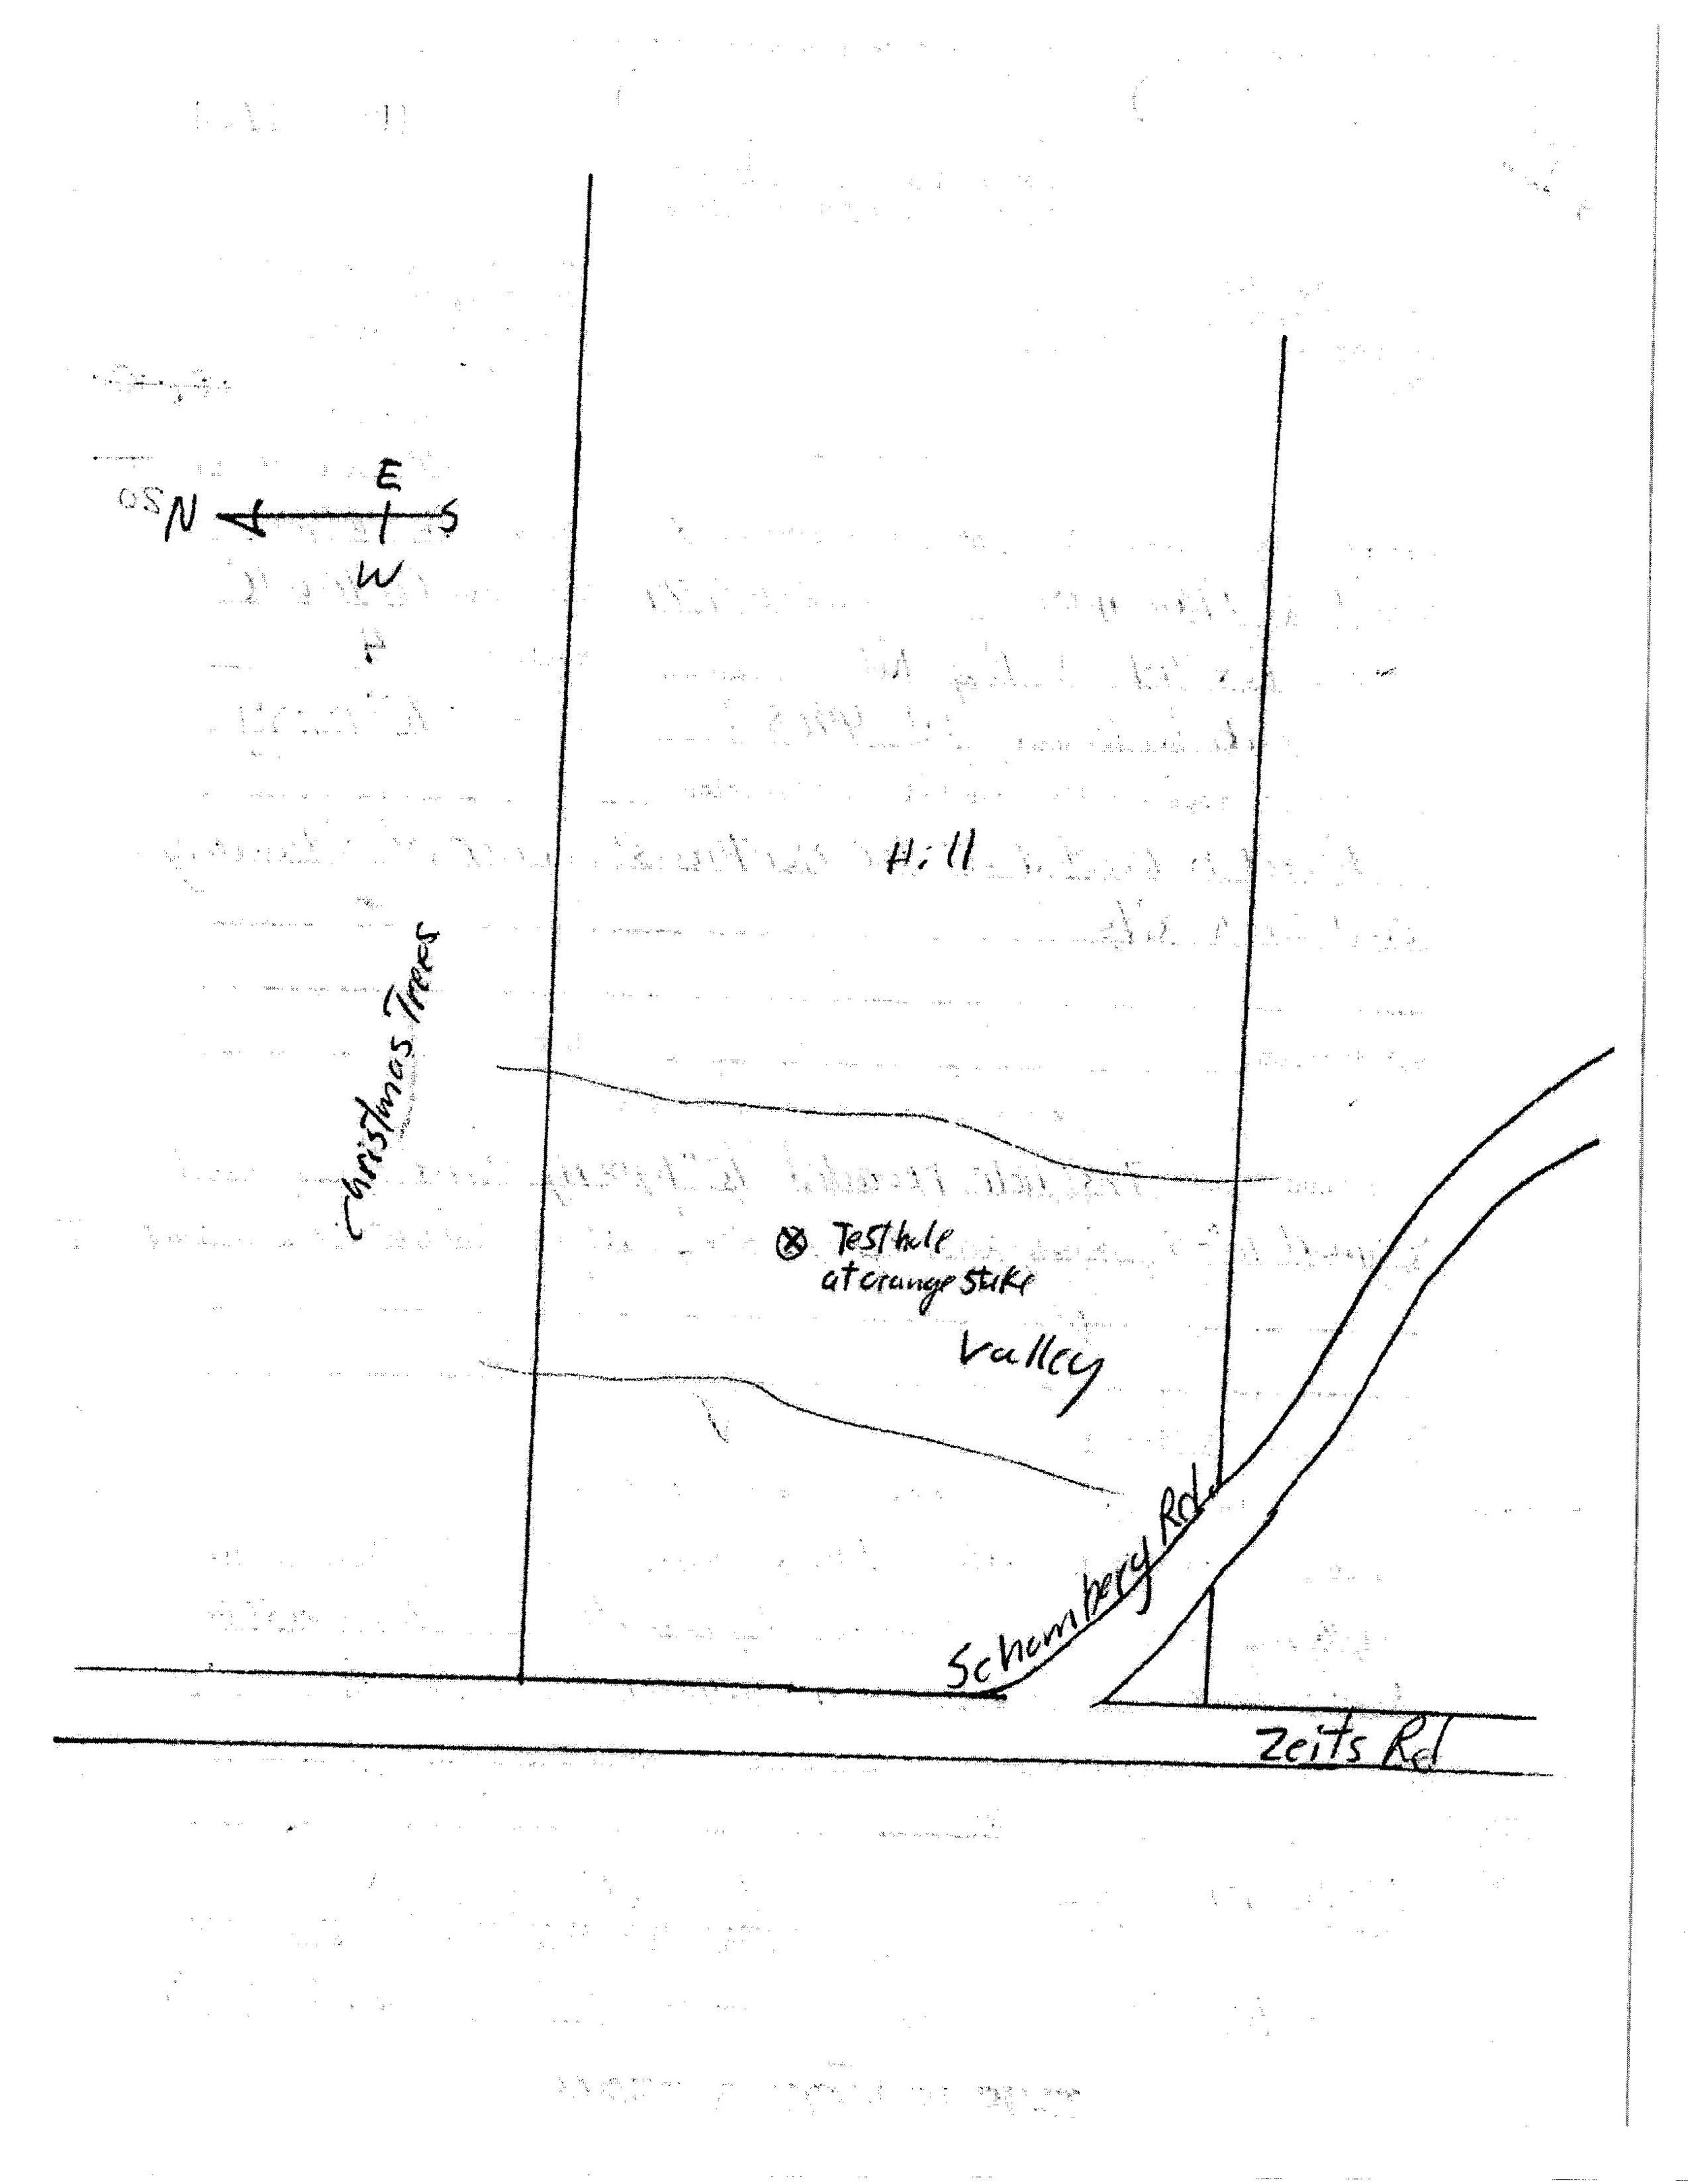 10 Acres – S Schomberg Road, Lake Leelanau – FOR SALE by Oltersdorf Realty (Marketing Packet) (7).jpg